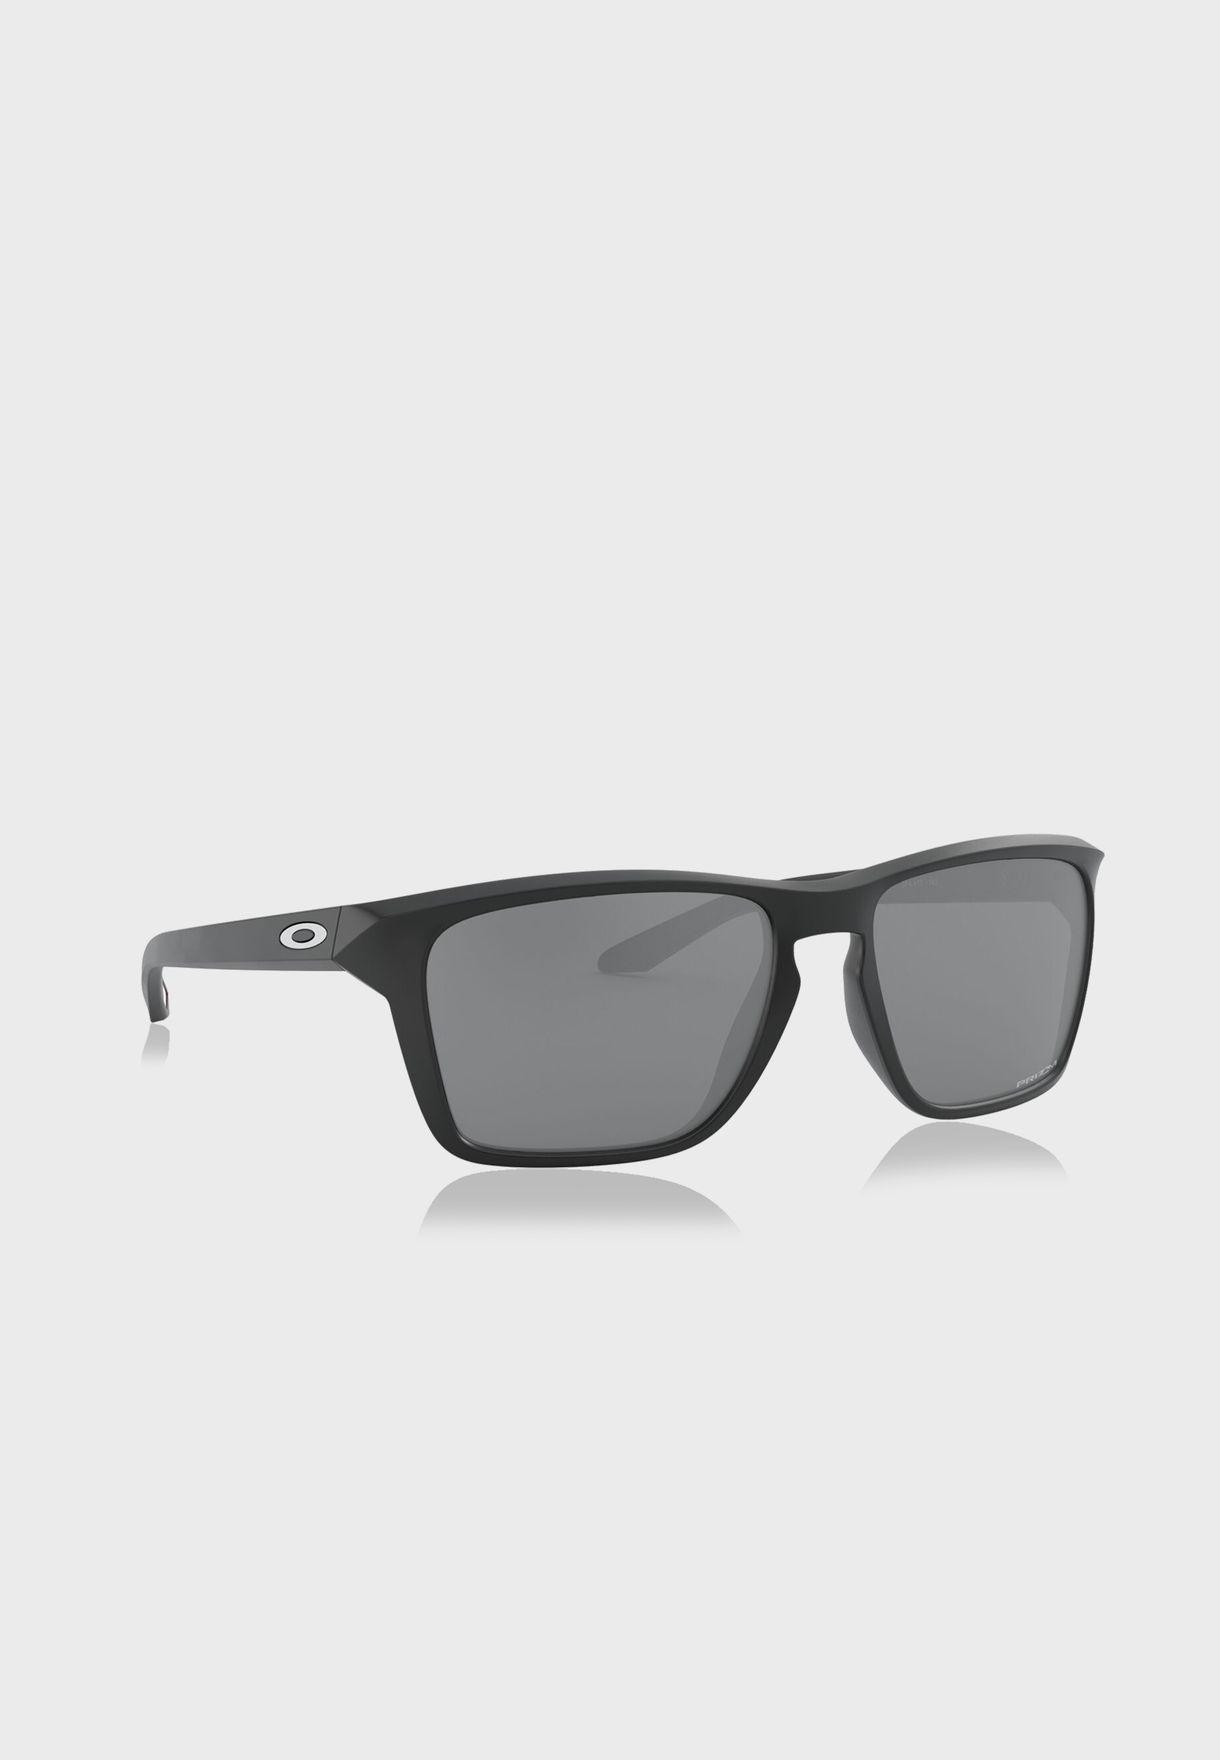 94480357 Wayfarer Sunglasses